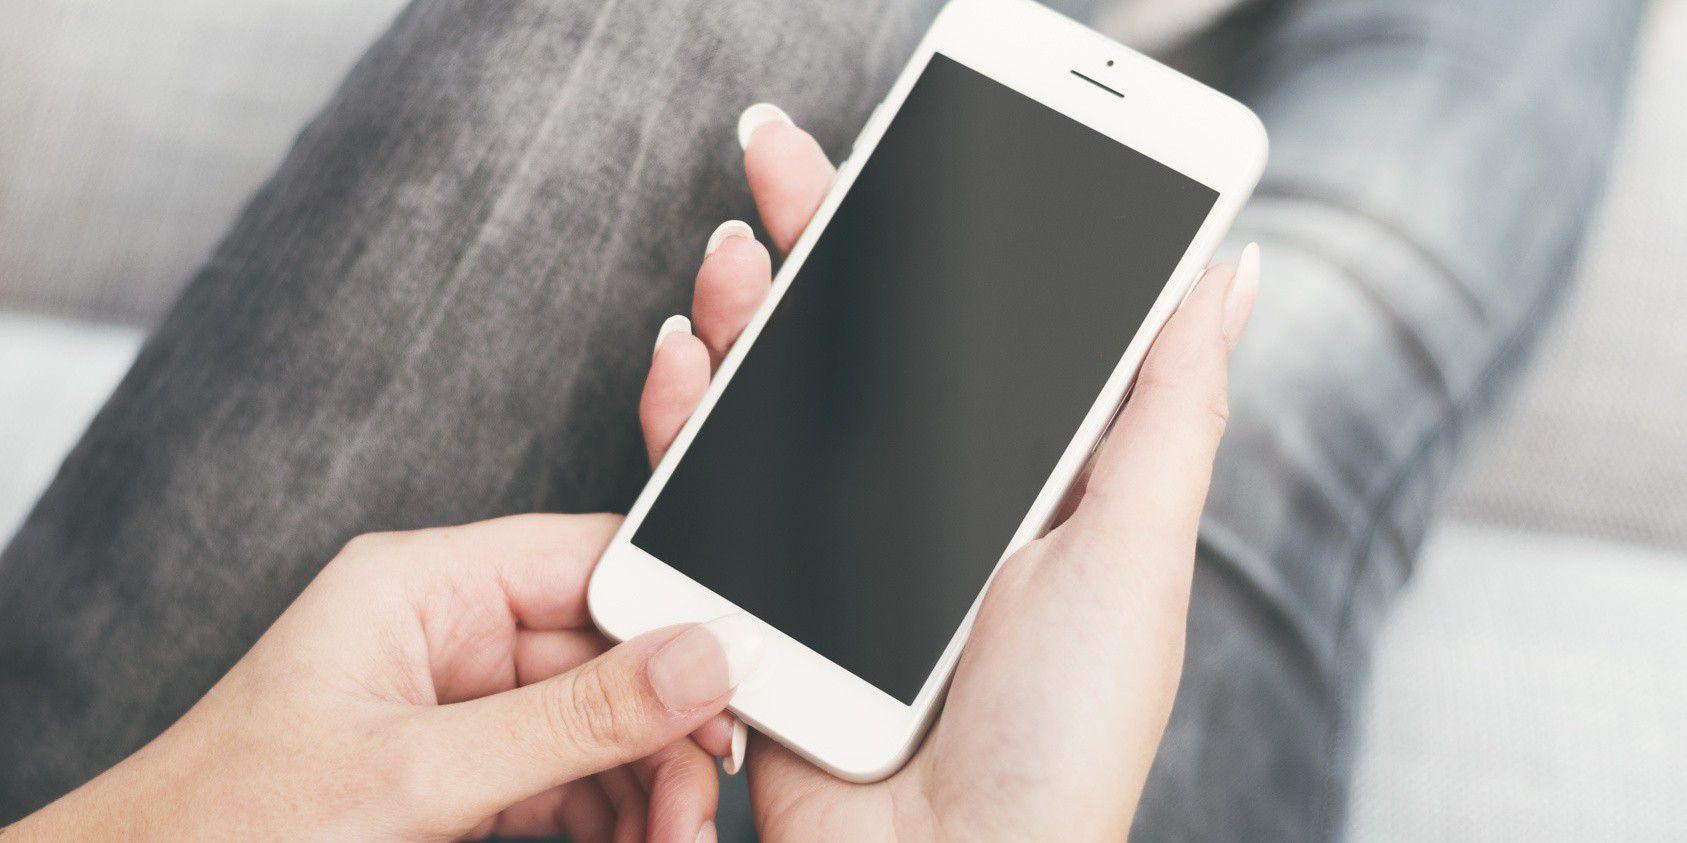 iphone 8 am pc öffnen geht nicht